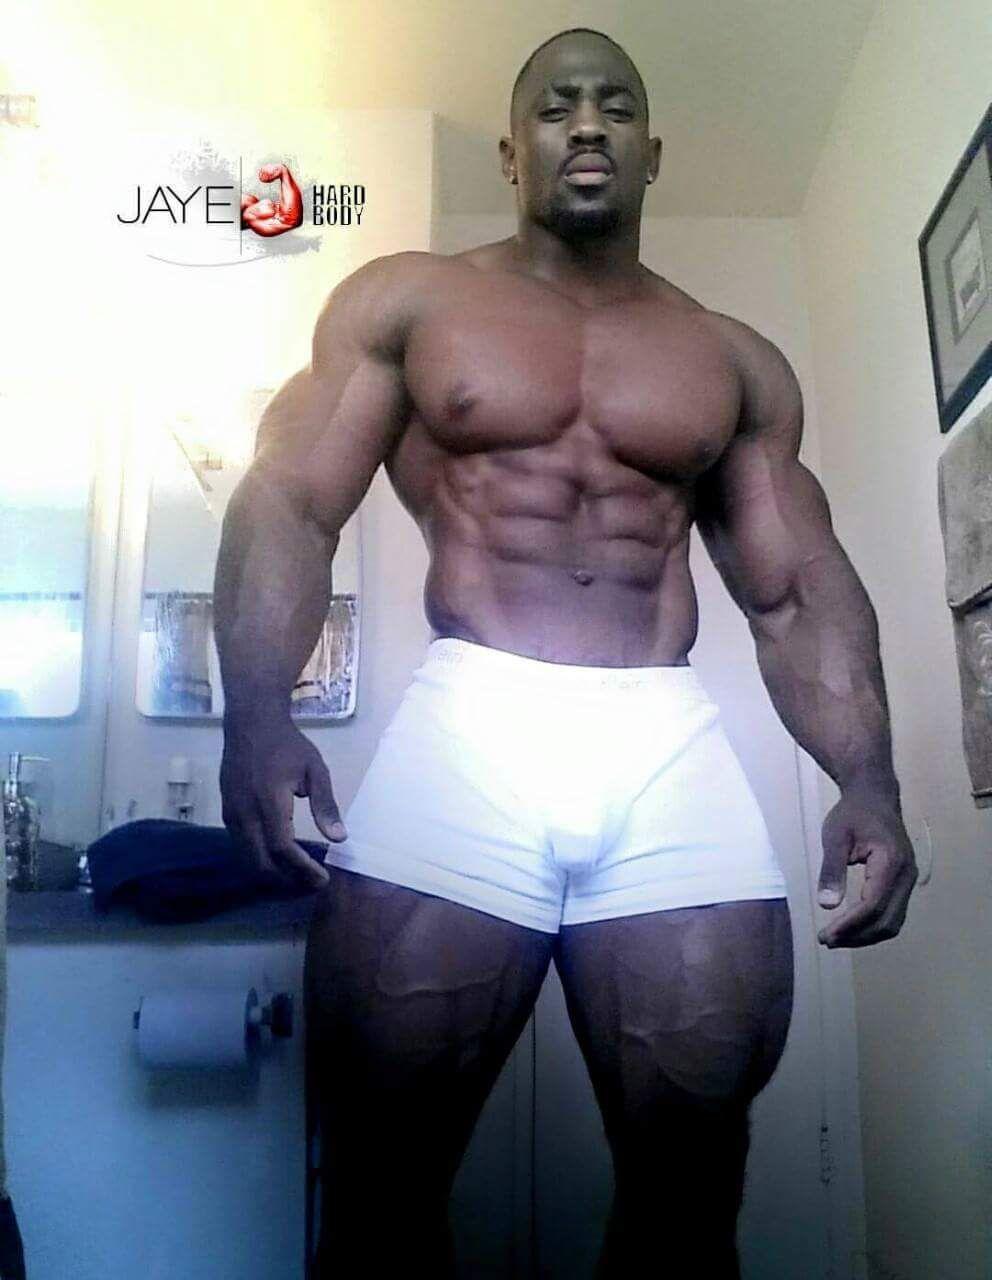 Pin by Abercrombie on jeremyliciouswilliams.com   Muscle ...